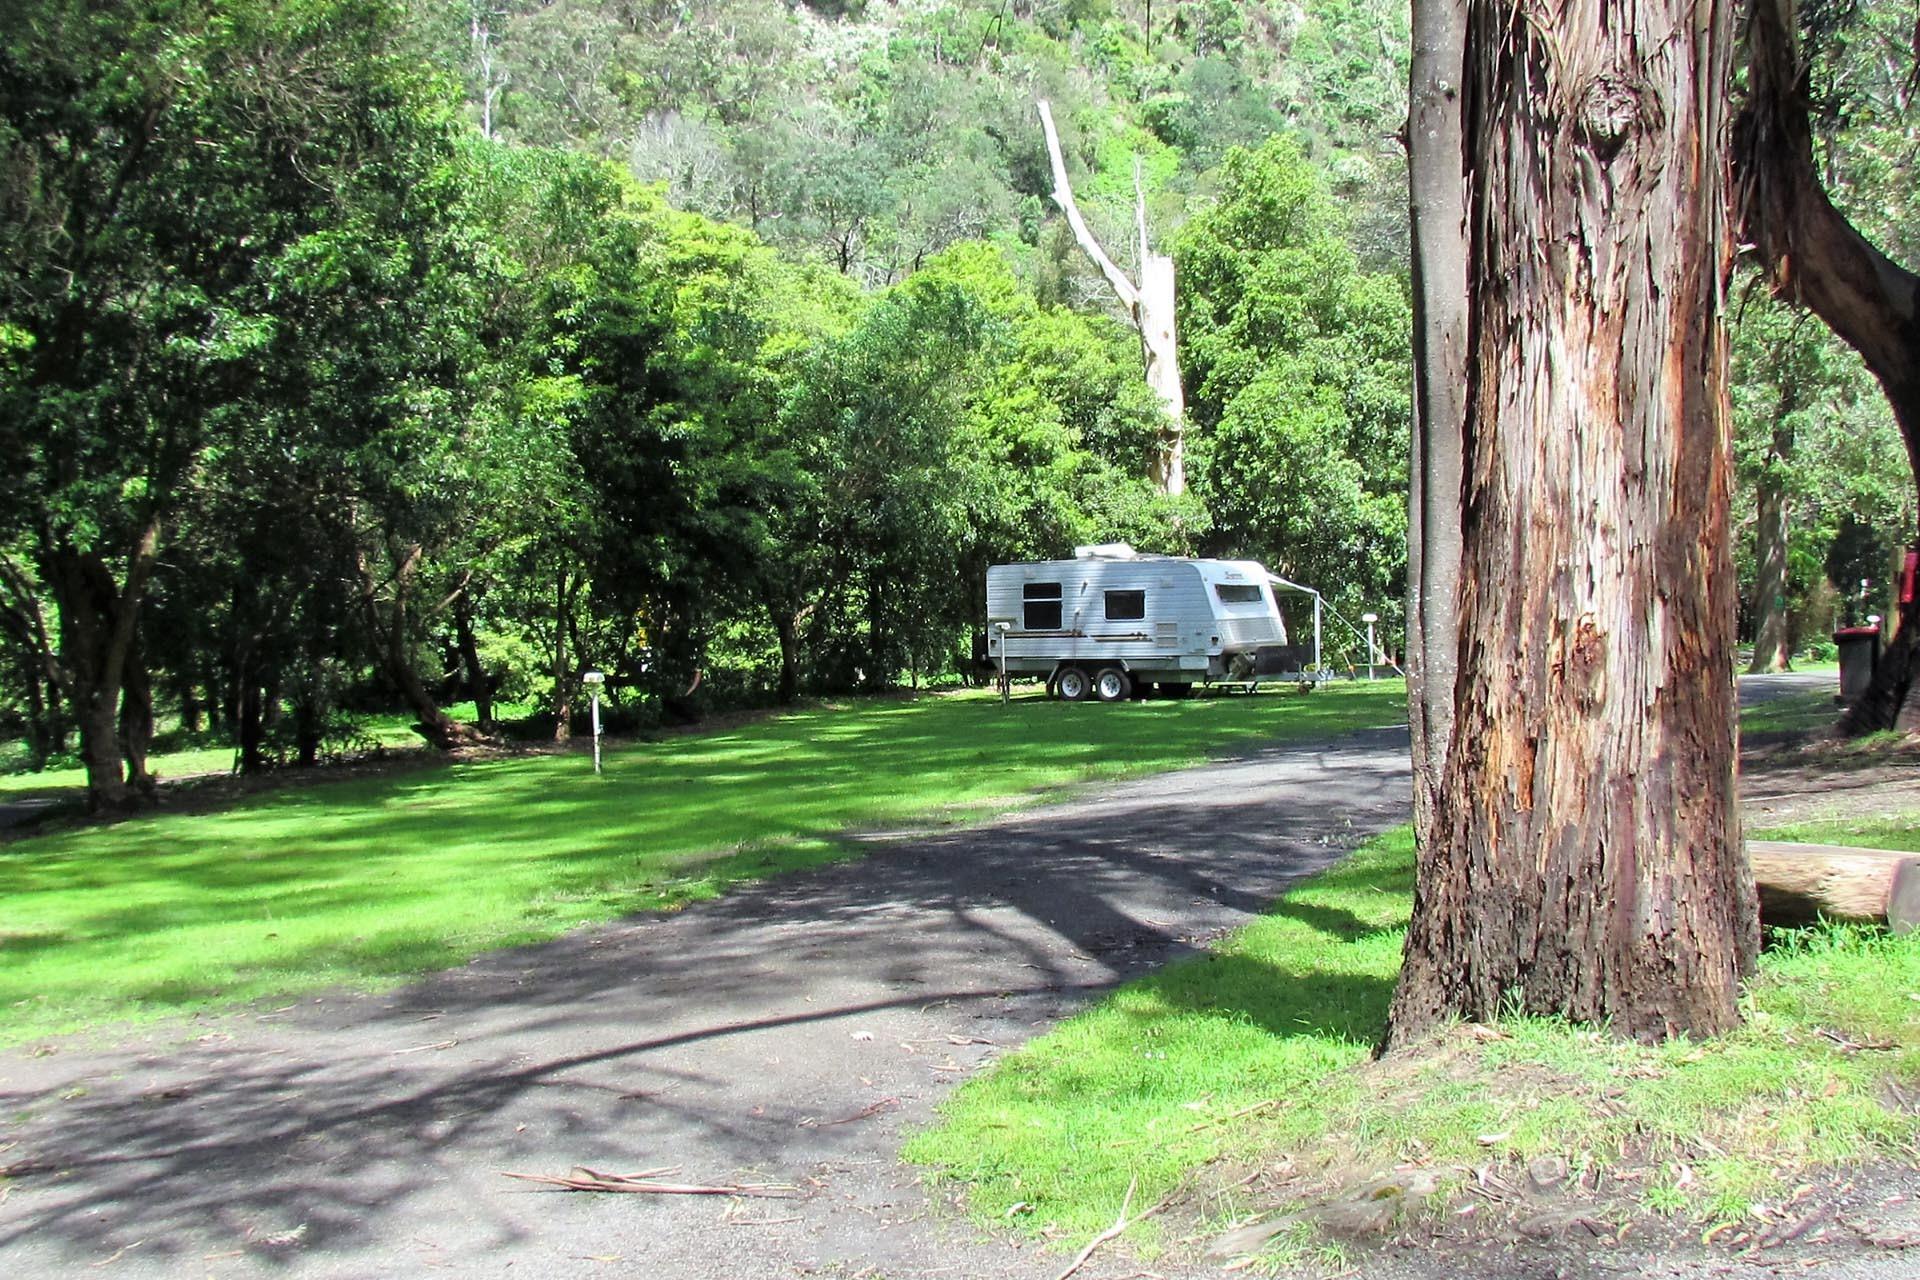 b - Tarra Valley Caravan Park